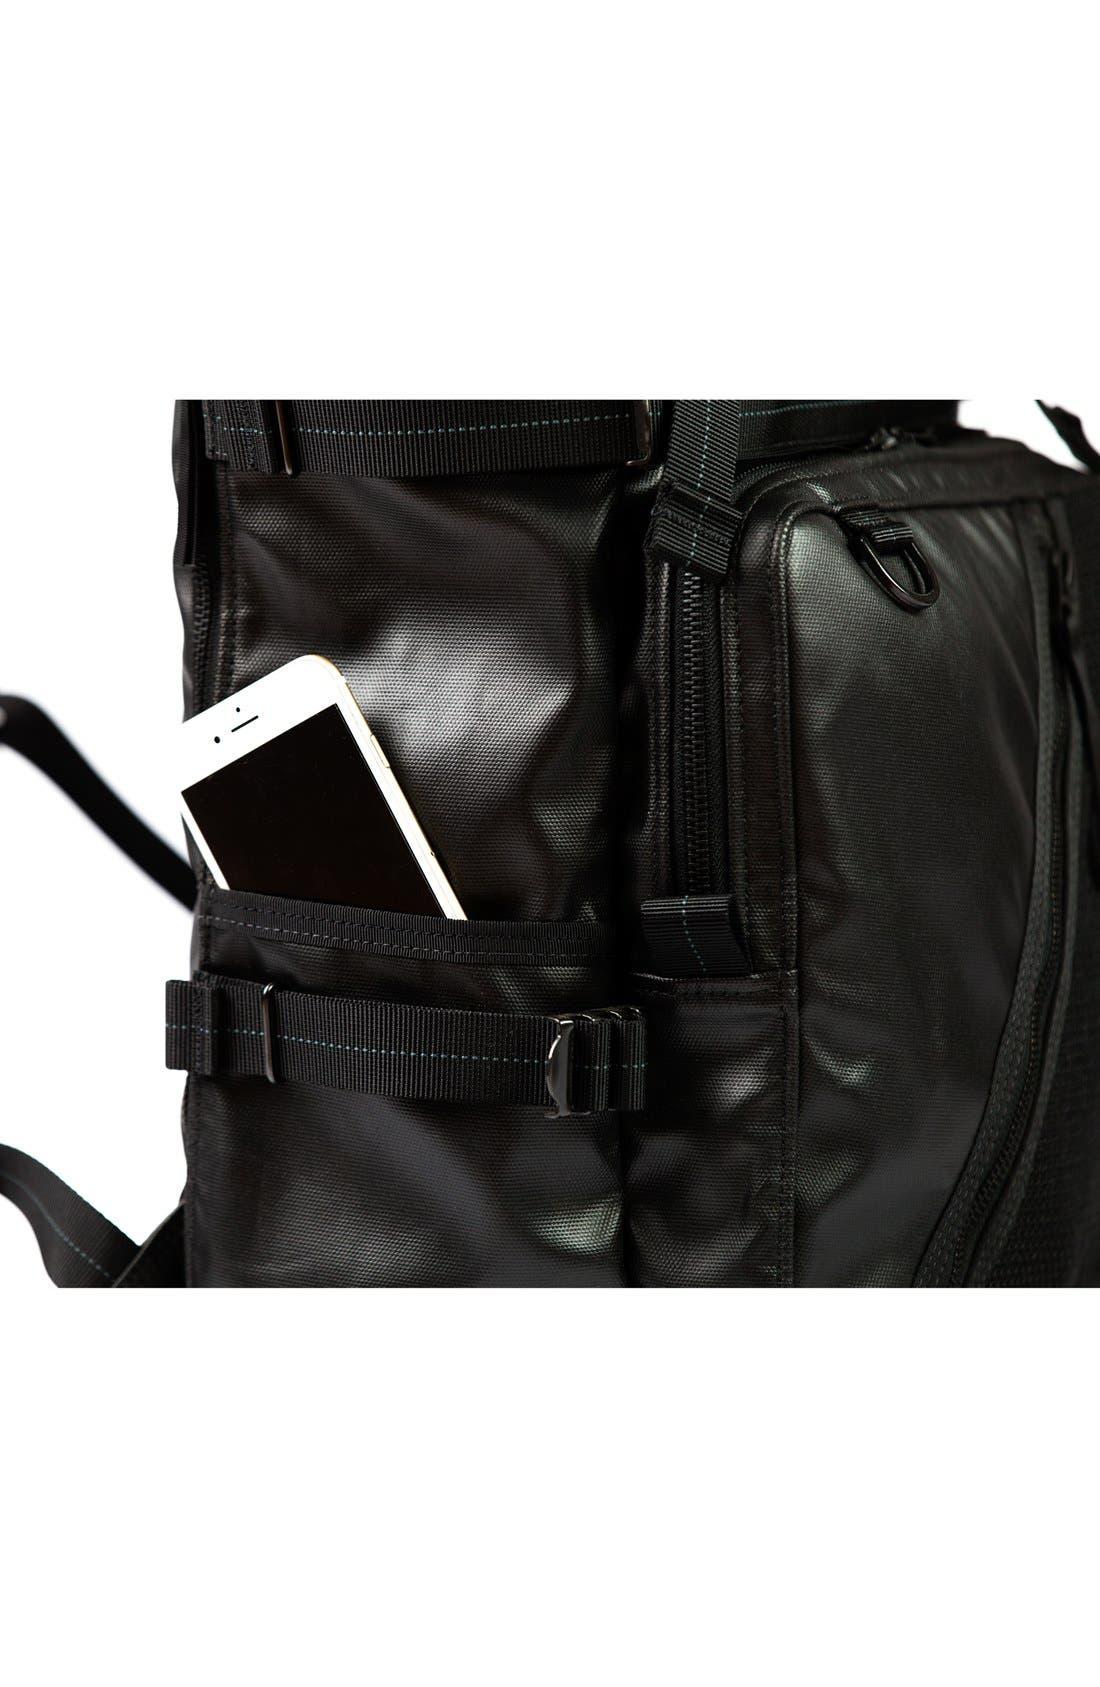 'NightHawk' Backpack,                             Alternate thumbnail 8, color,                             Black